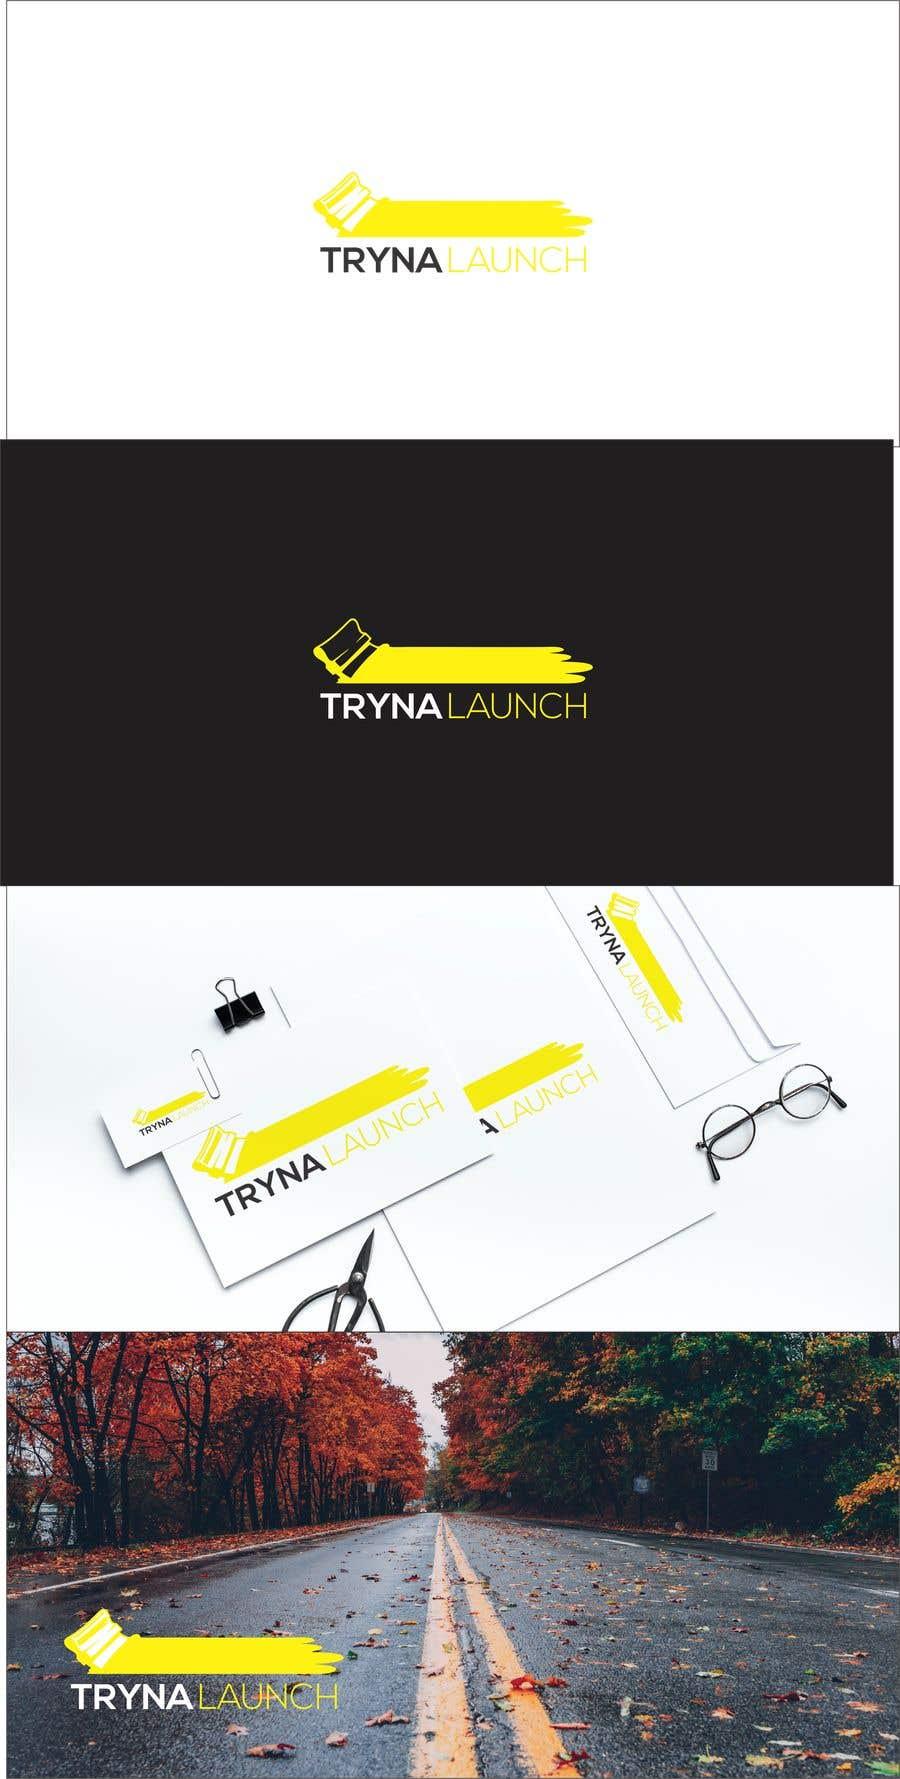 Kilpailutyö #                                        144                                      kilpailussa                                         draw a screen printable logo